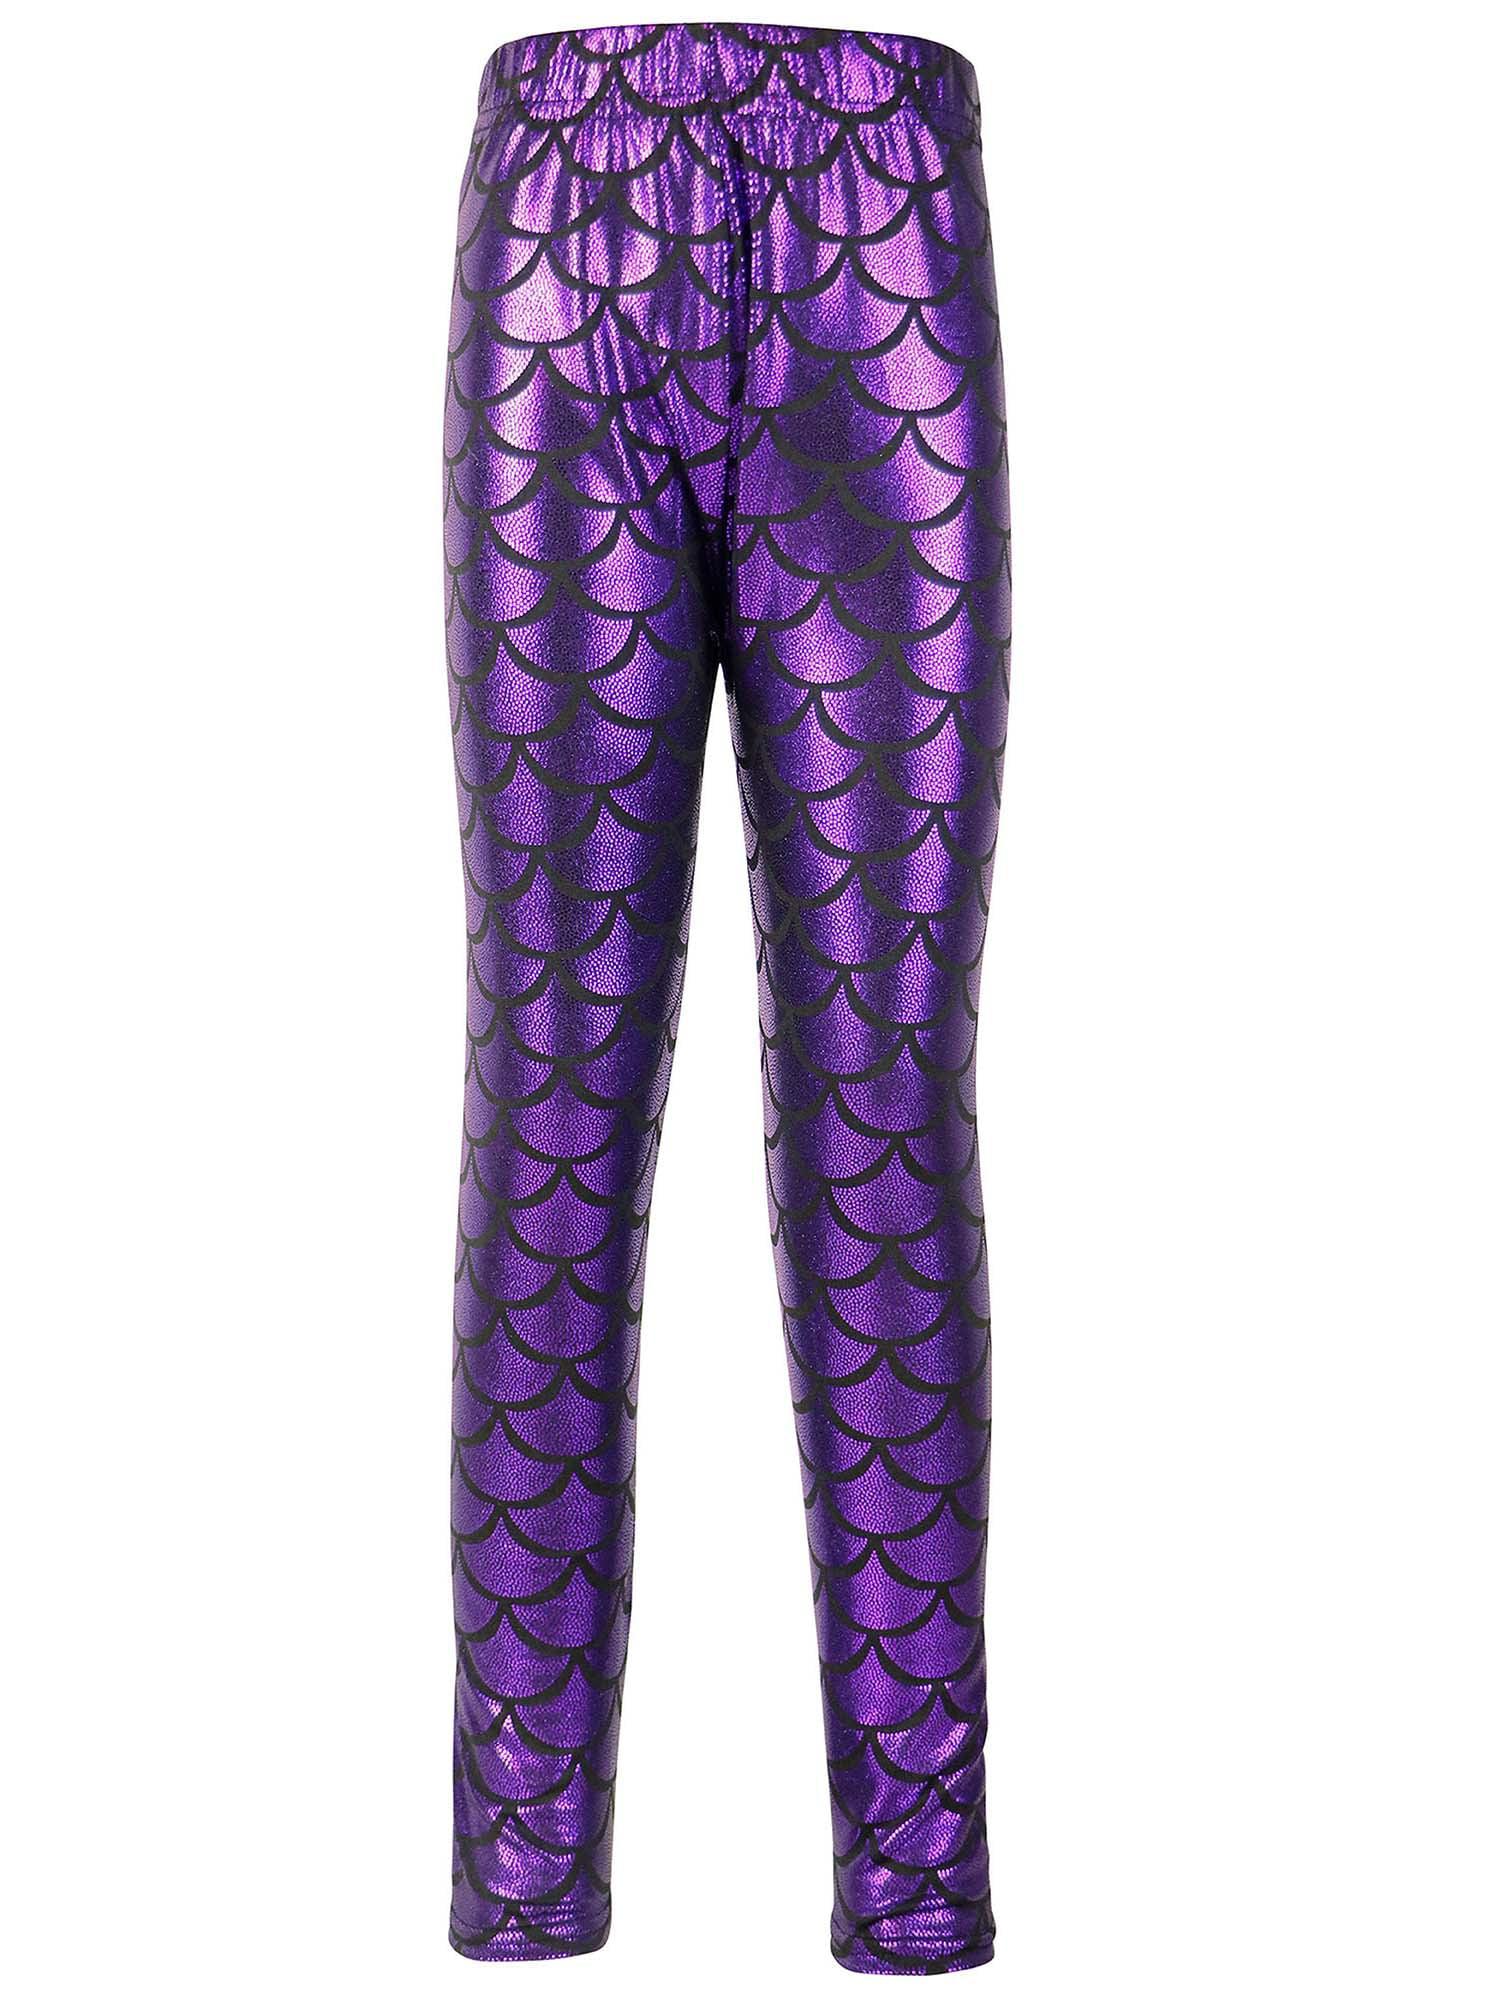 Simplicity Girls Mermaid Fish Scale Print Full Length Leggings Pants, Purple, S